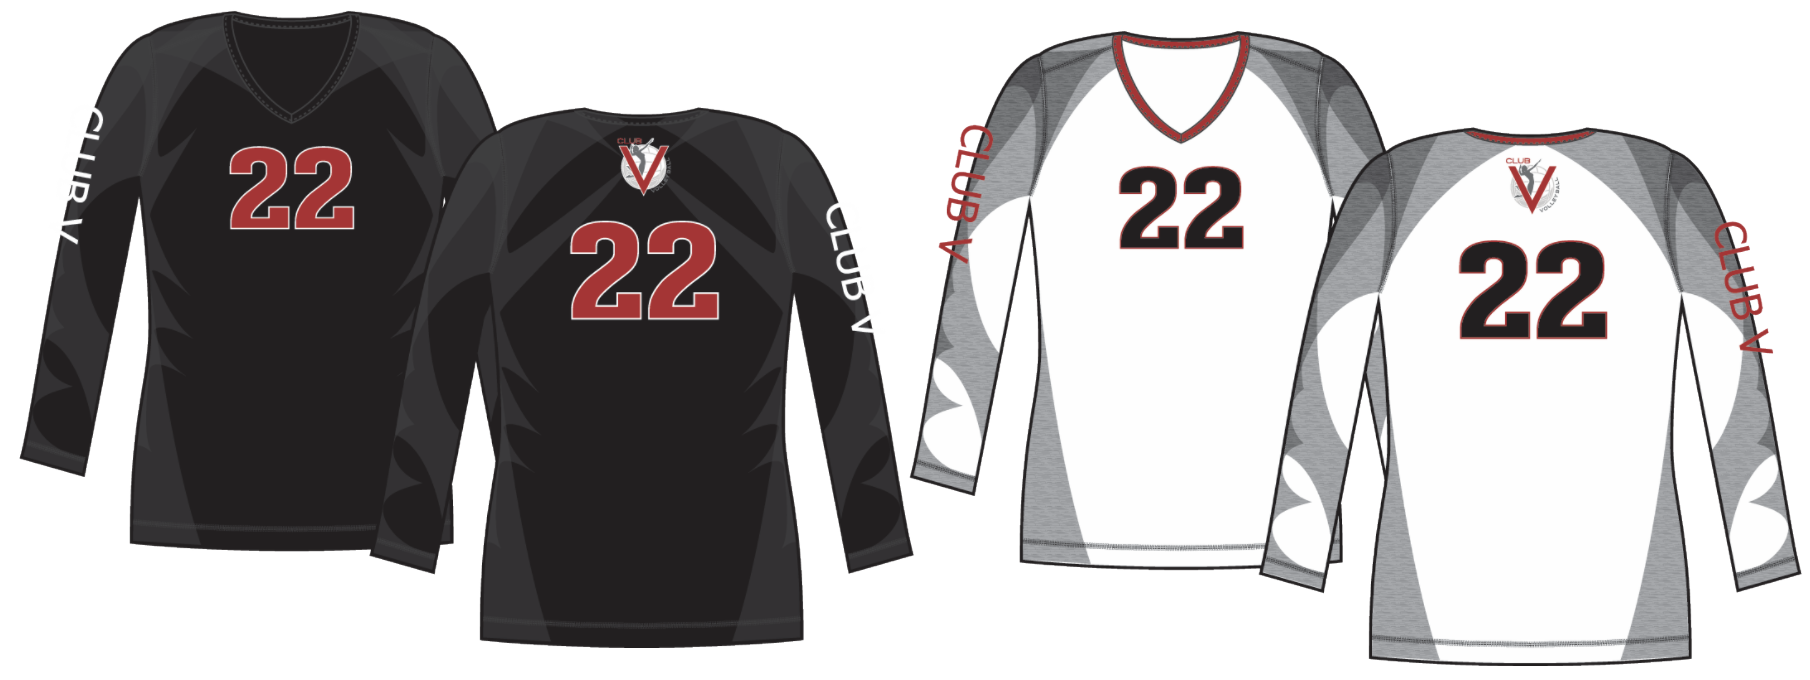 CLUB V Volleyball Custom Uniforms